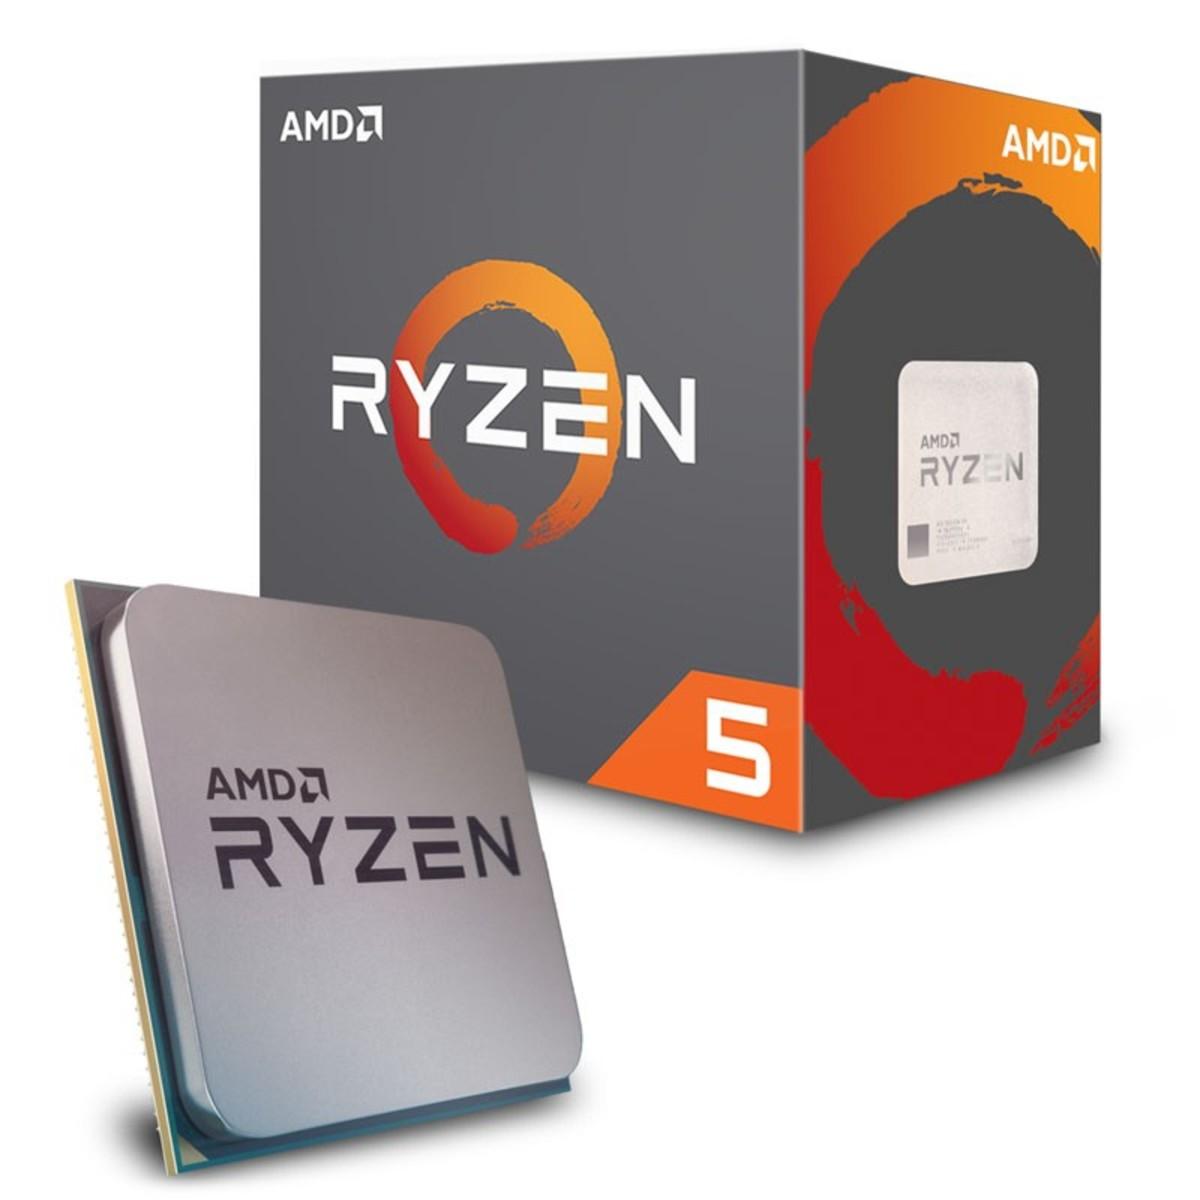 AMD Ryzen 5 2600 vs Intel Core i7-7700K with Benchmarks